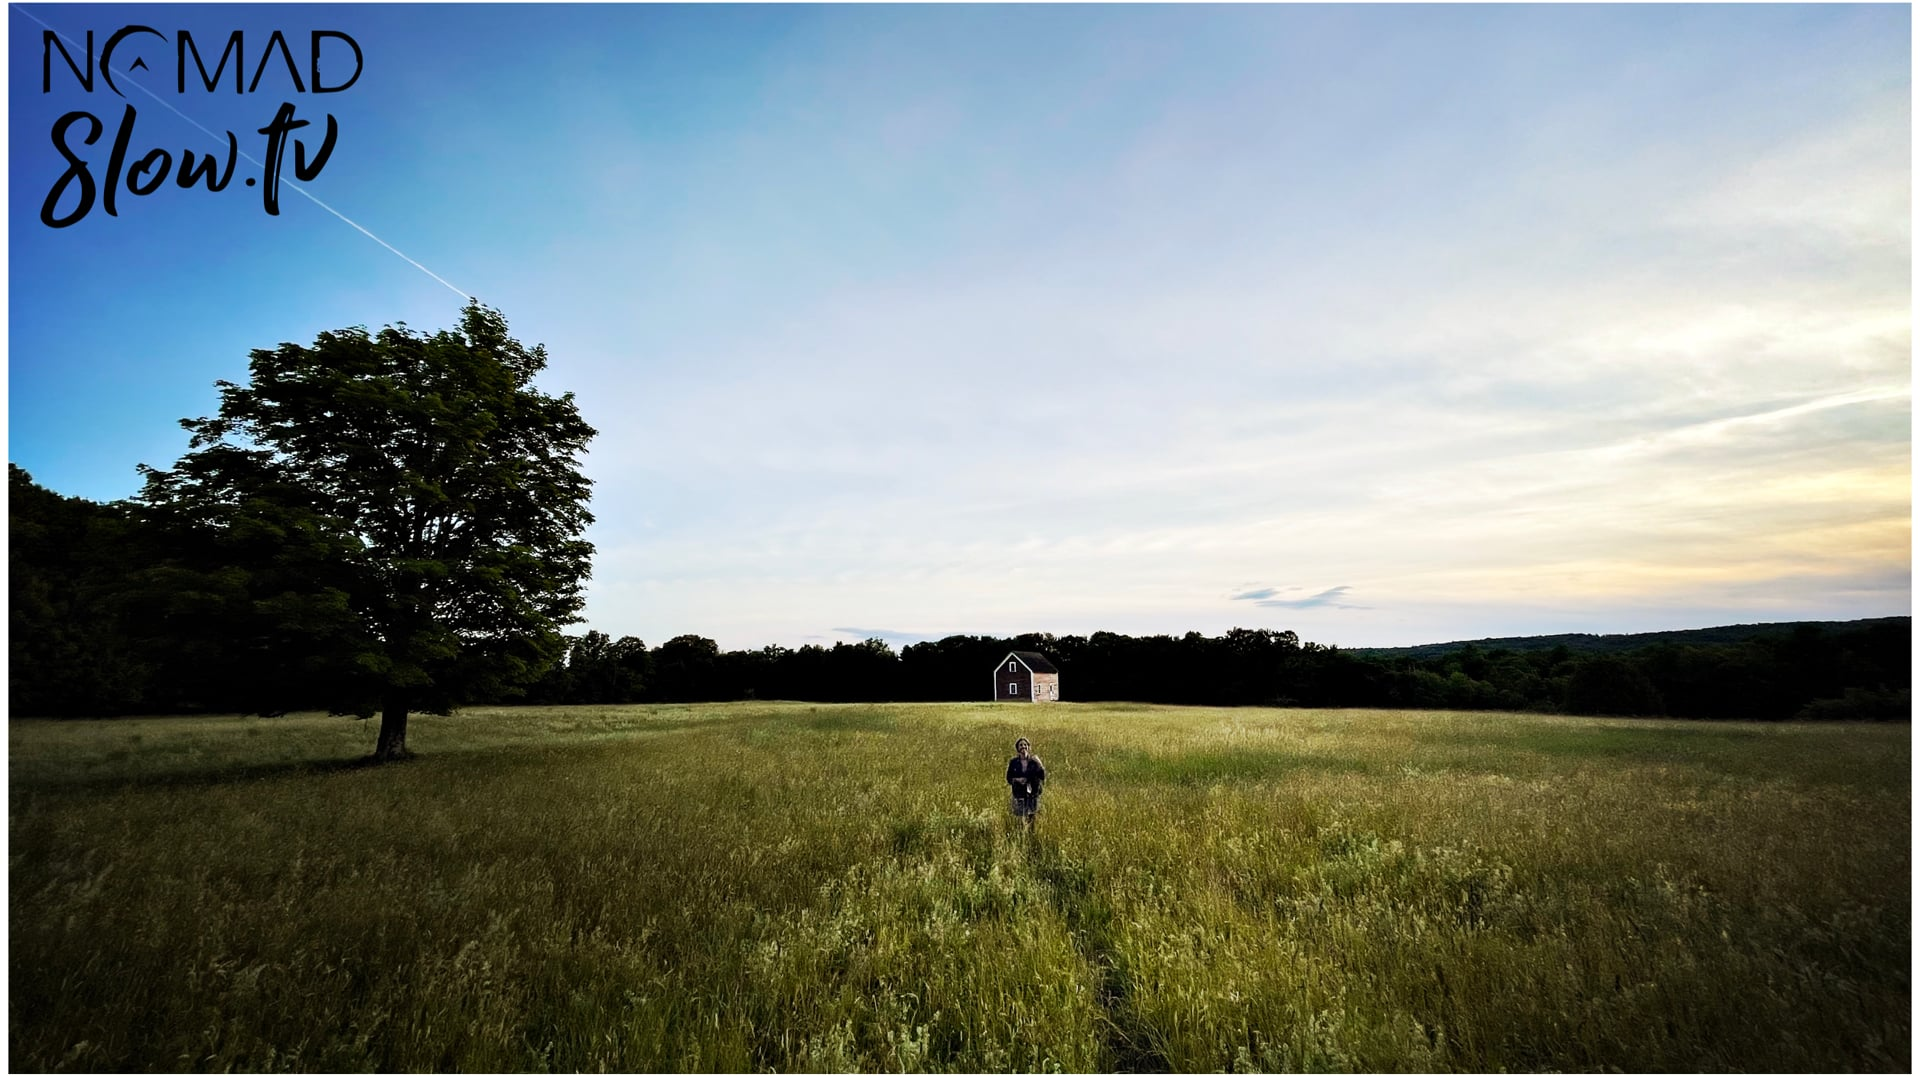 Early Evening at an Ogden Summer Field - Water Lillies - Density & Time